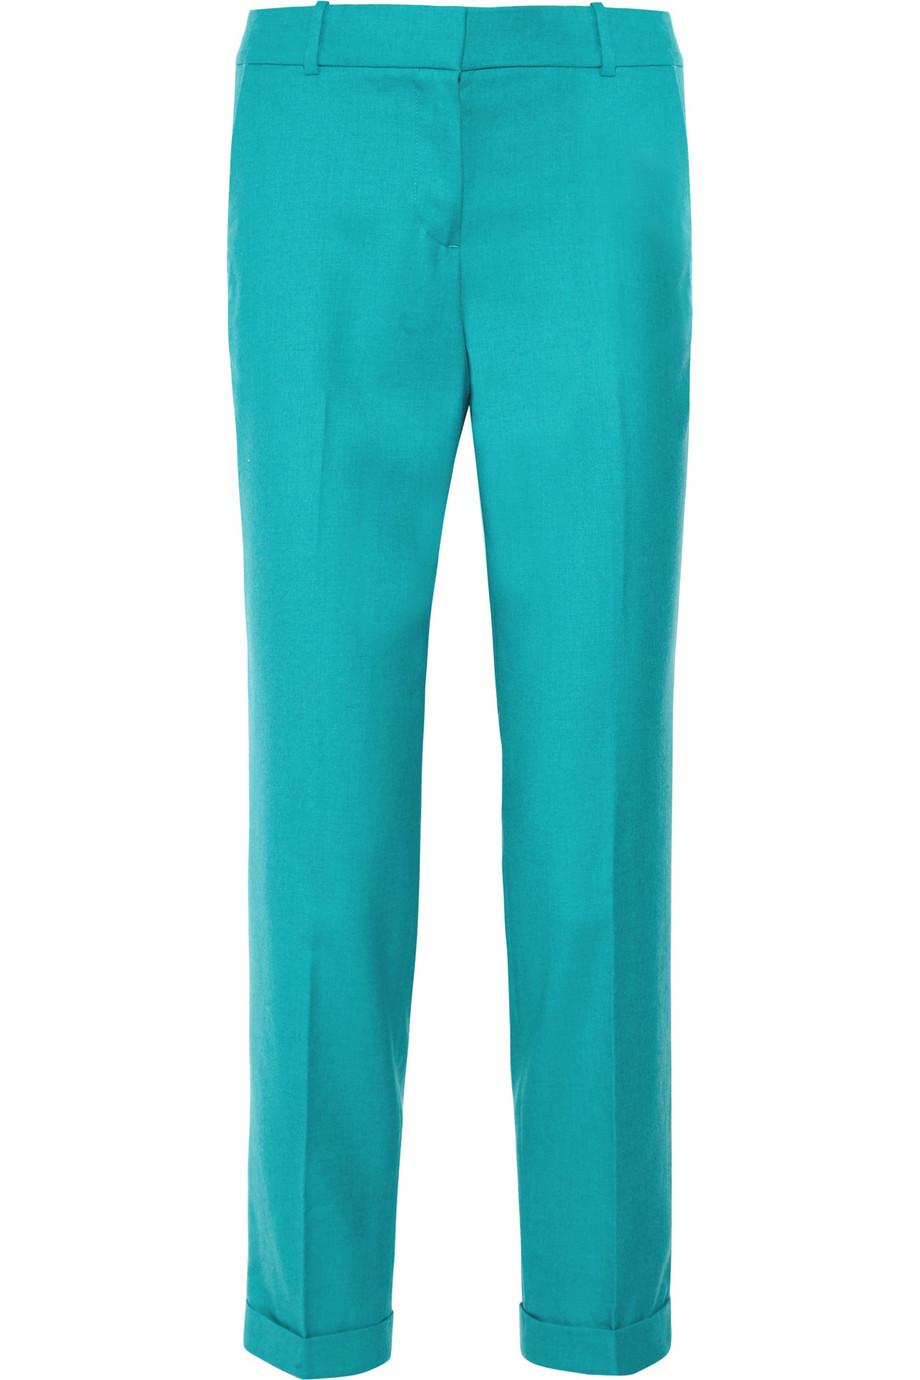 J Crew Caf 233 Wooltwill Capri Pants In Blue Teal Lyst